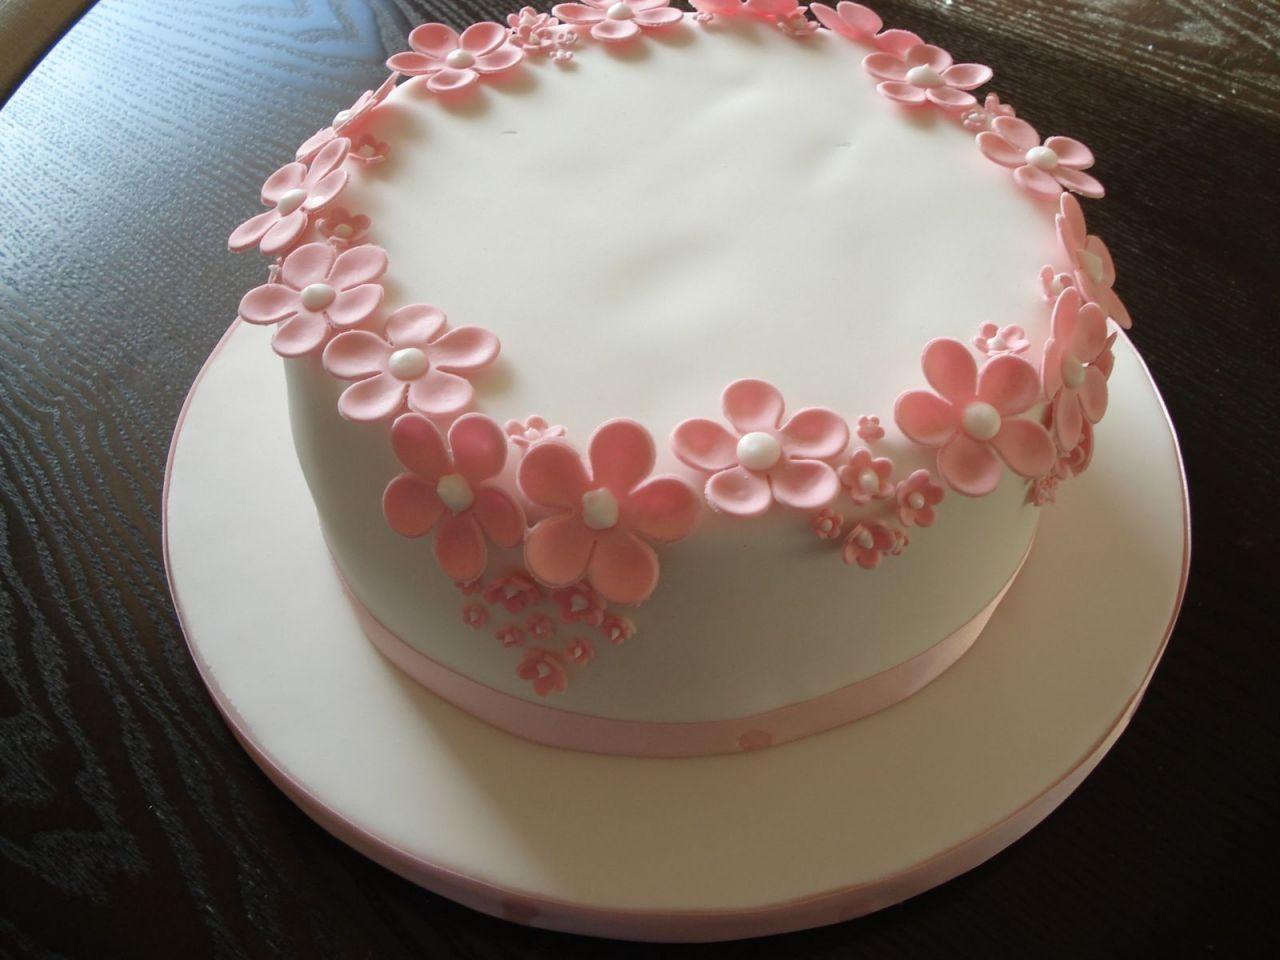 Simple Birthday Cake Designs - Cake Decorative | 60th ...